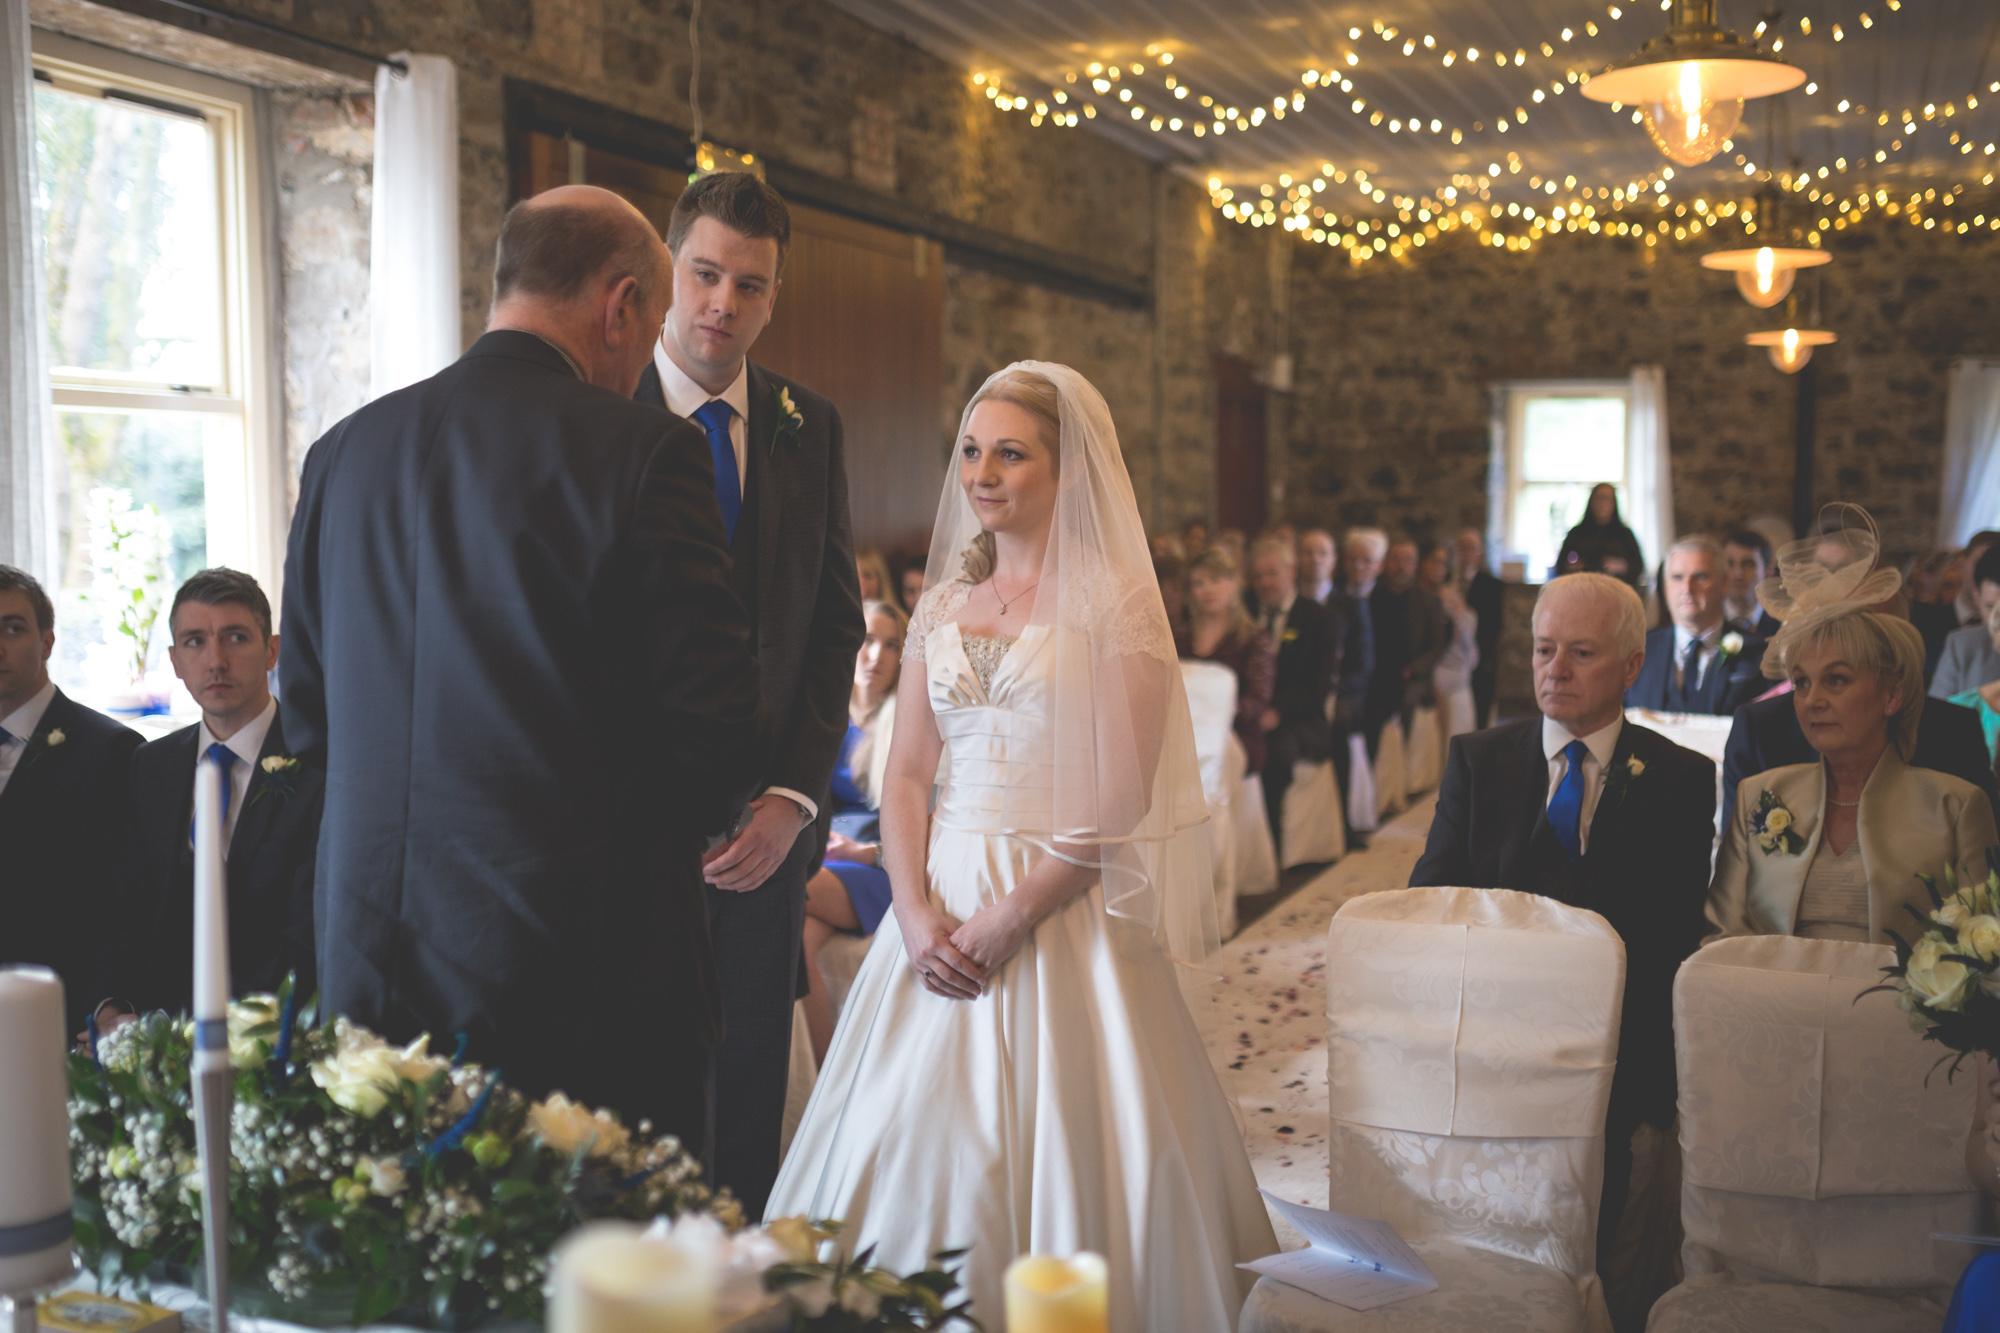 Steve_Emma_Ceremony-69.jpg